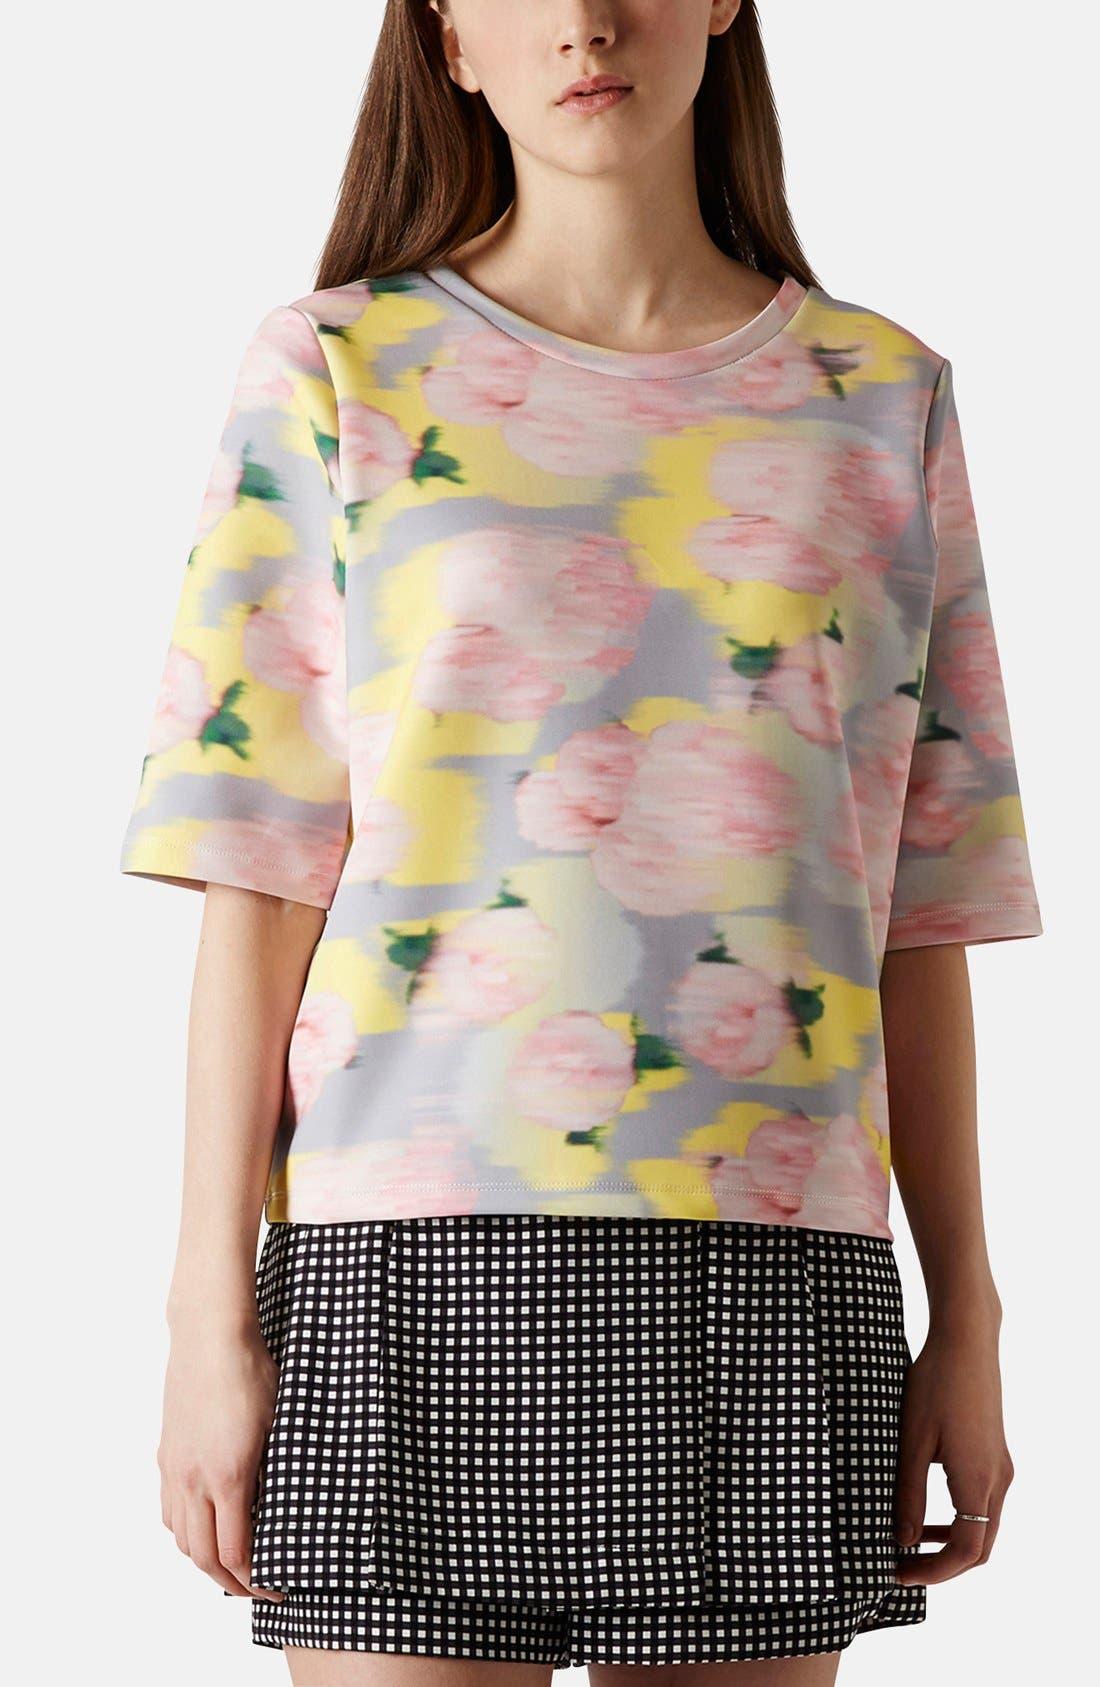 Main Image - Topshop 'Blurred Floral' Print Scuba Top